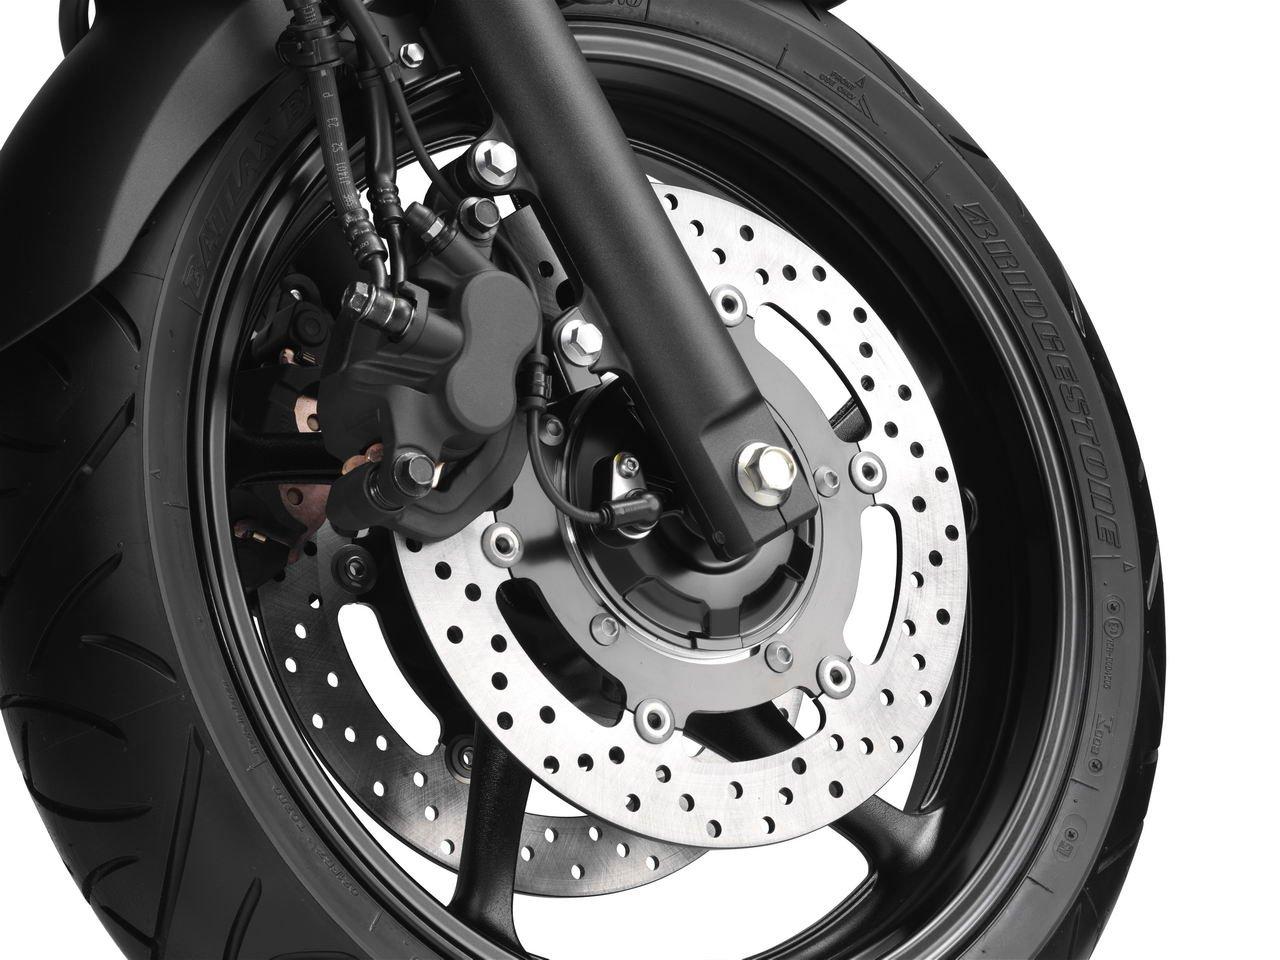 Listino Yamaha XJ 6 Naked Media - Moto.Motori.Net